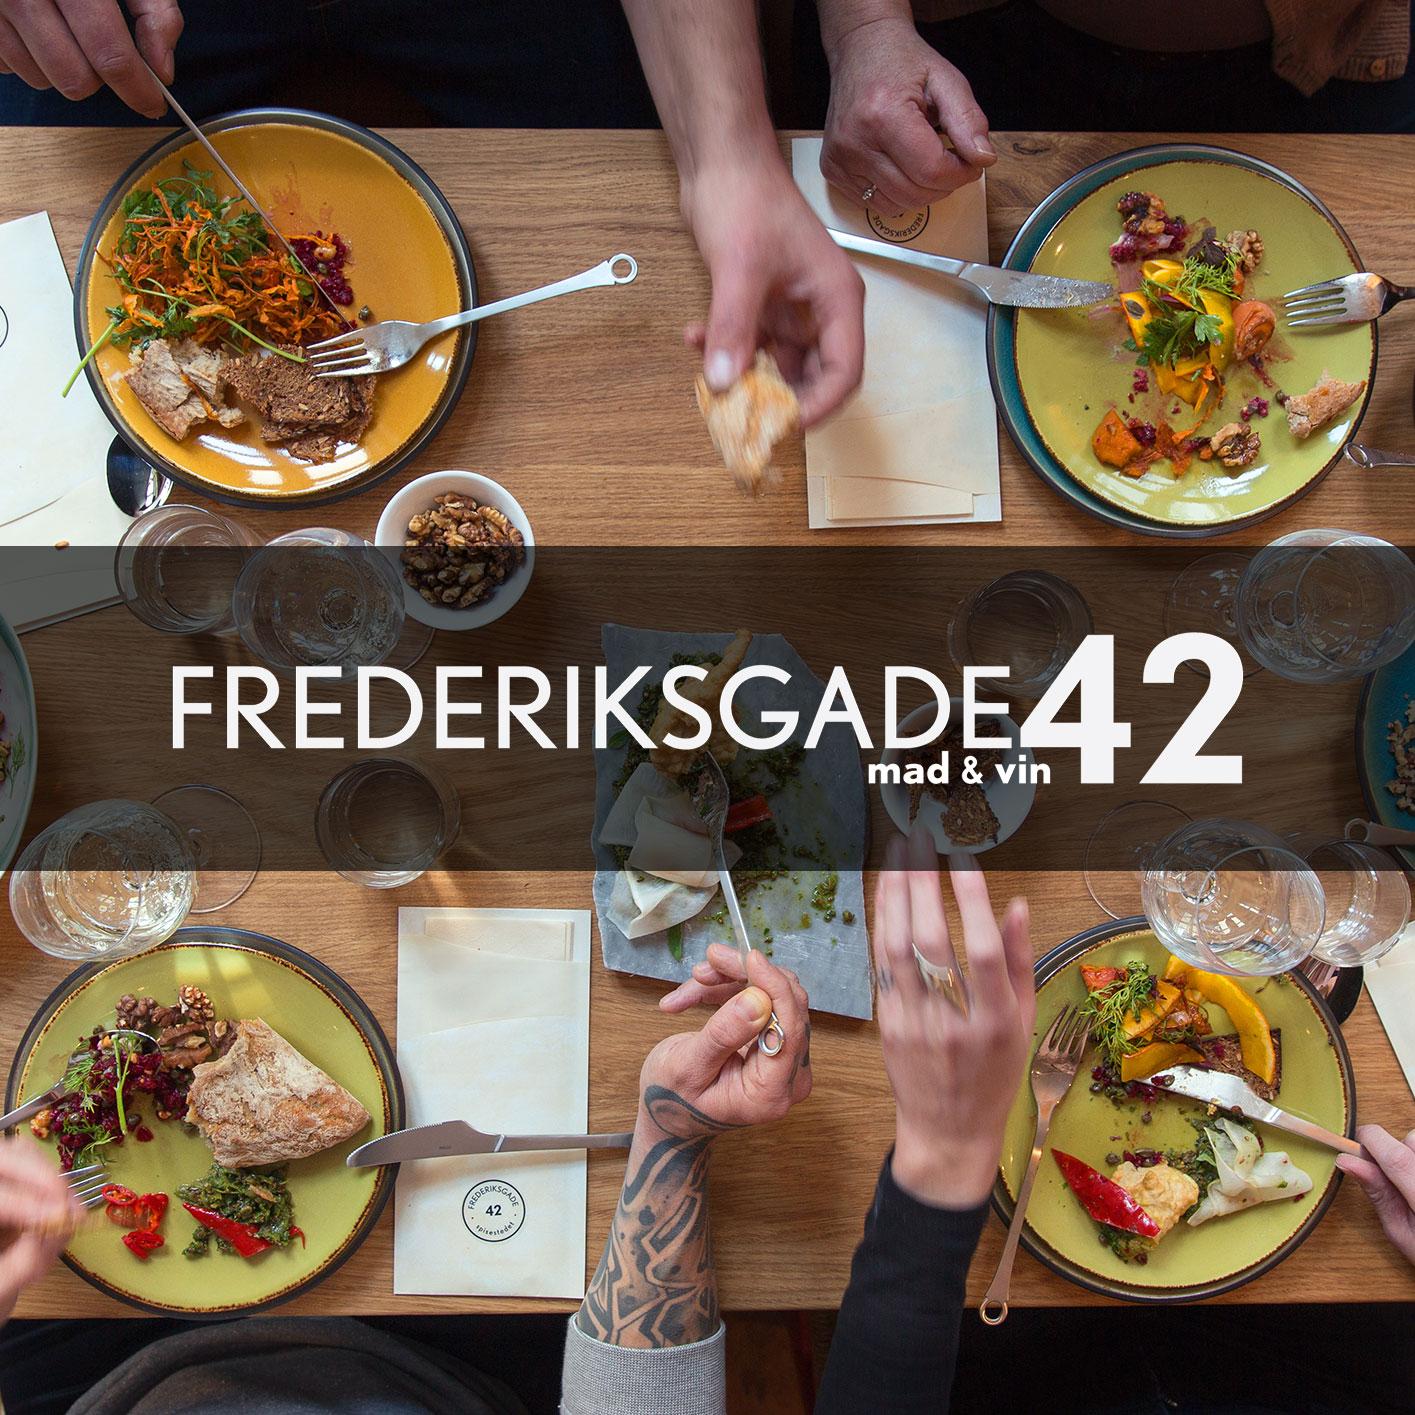 Frederiksgade42_logo_square.jpg